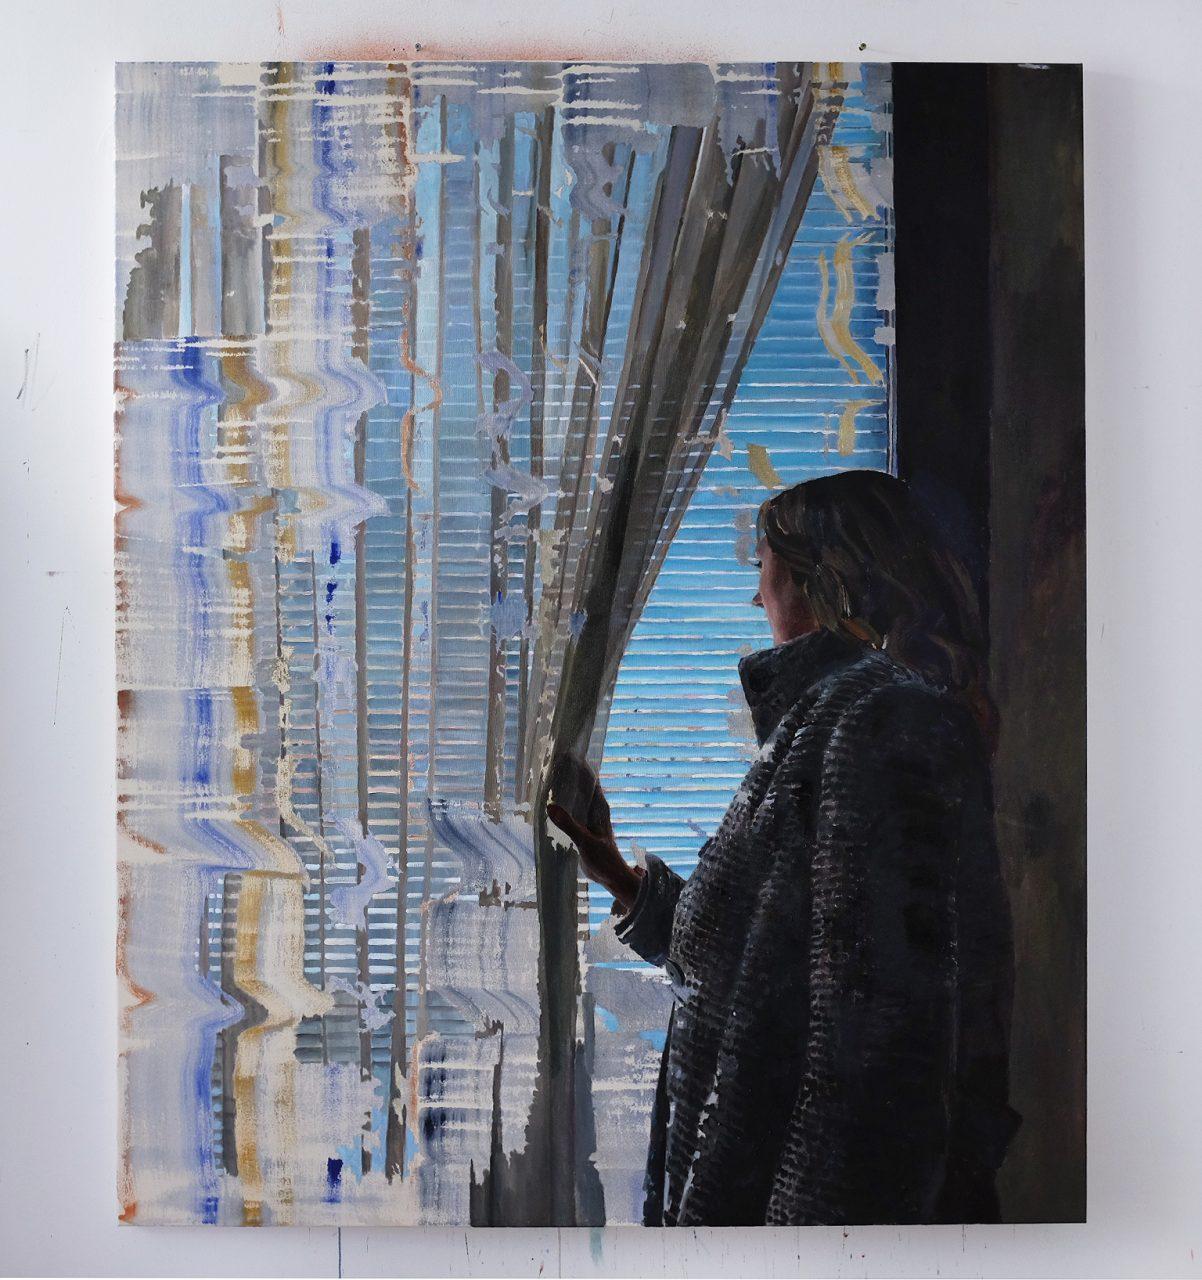 Life Was a Curtain, 2017, 180 x 150 cm